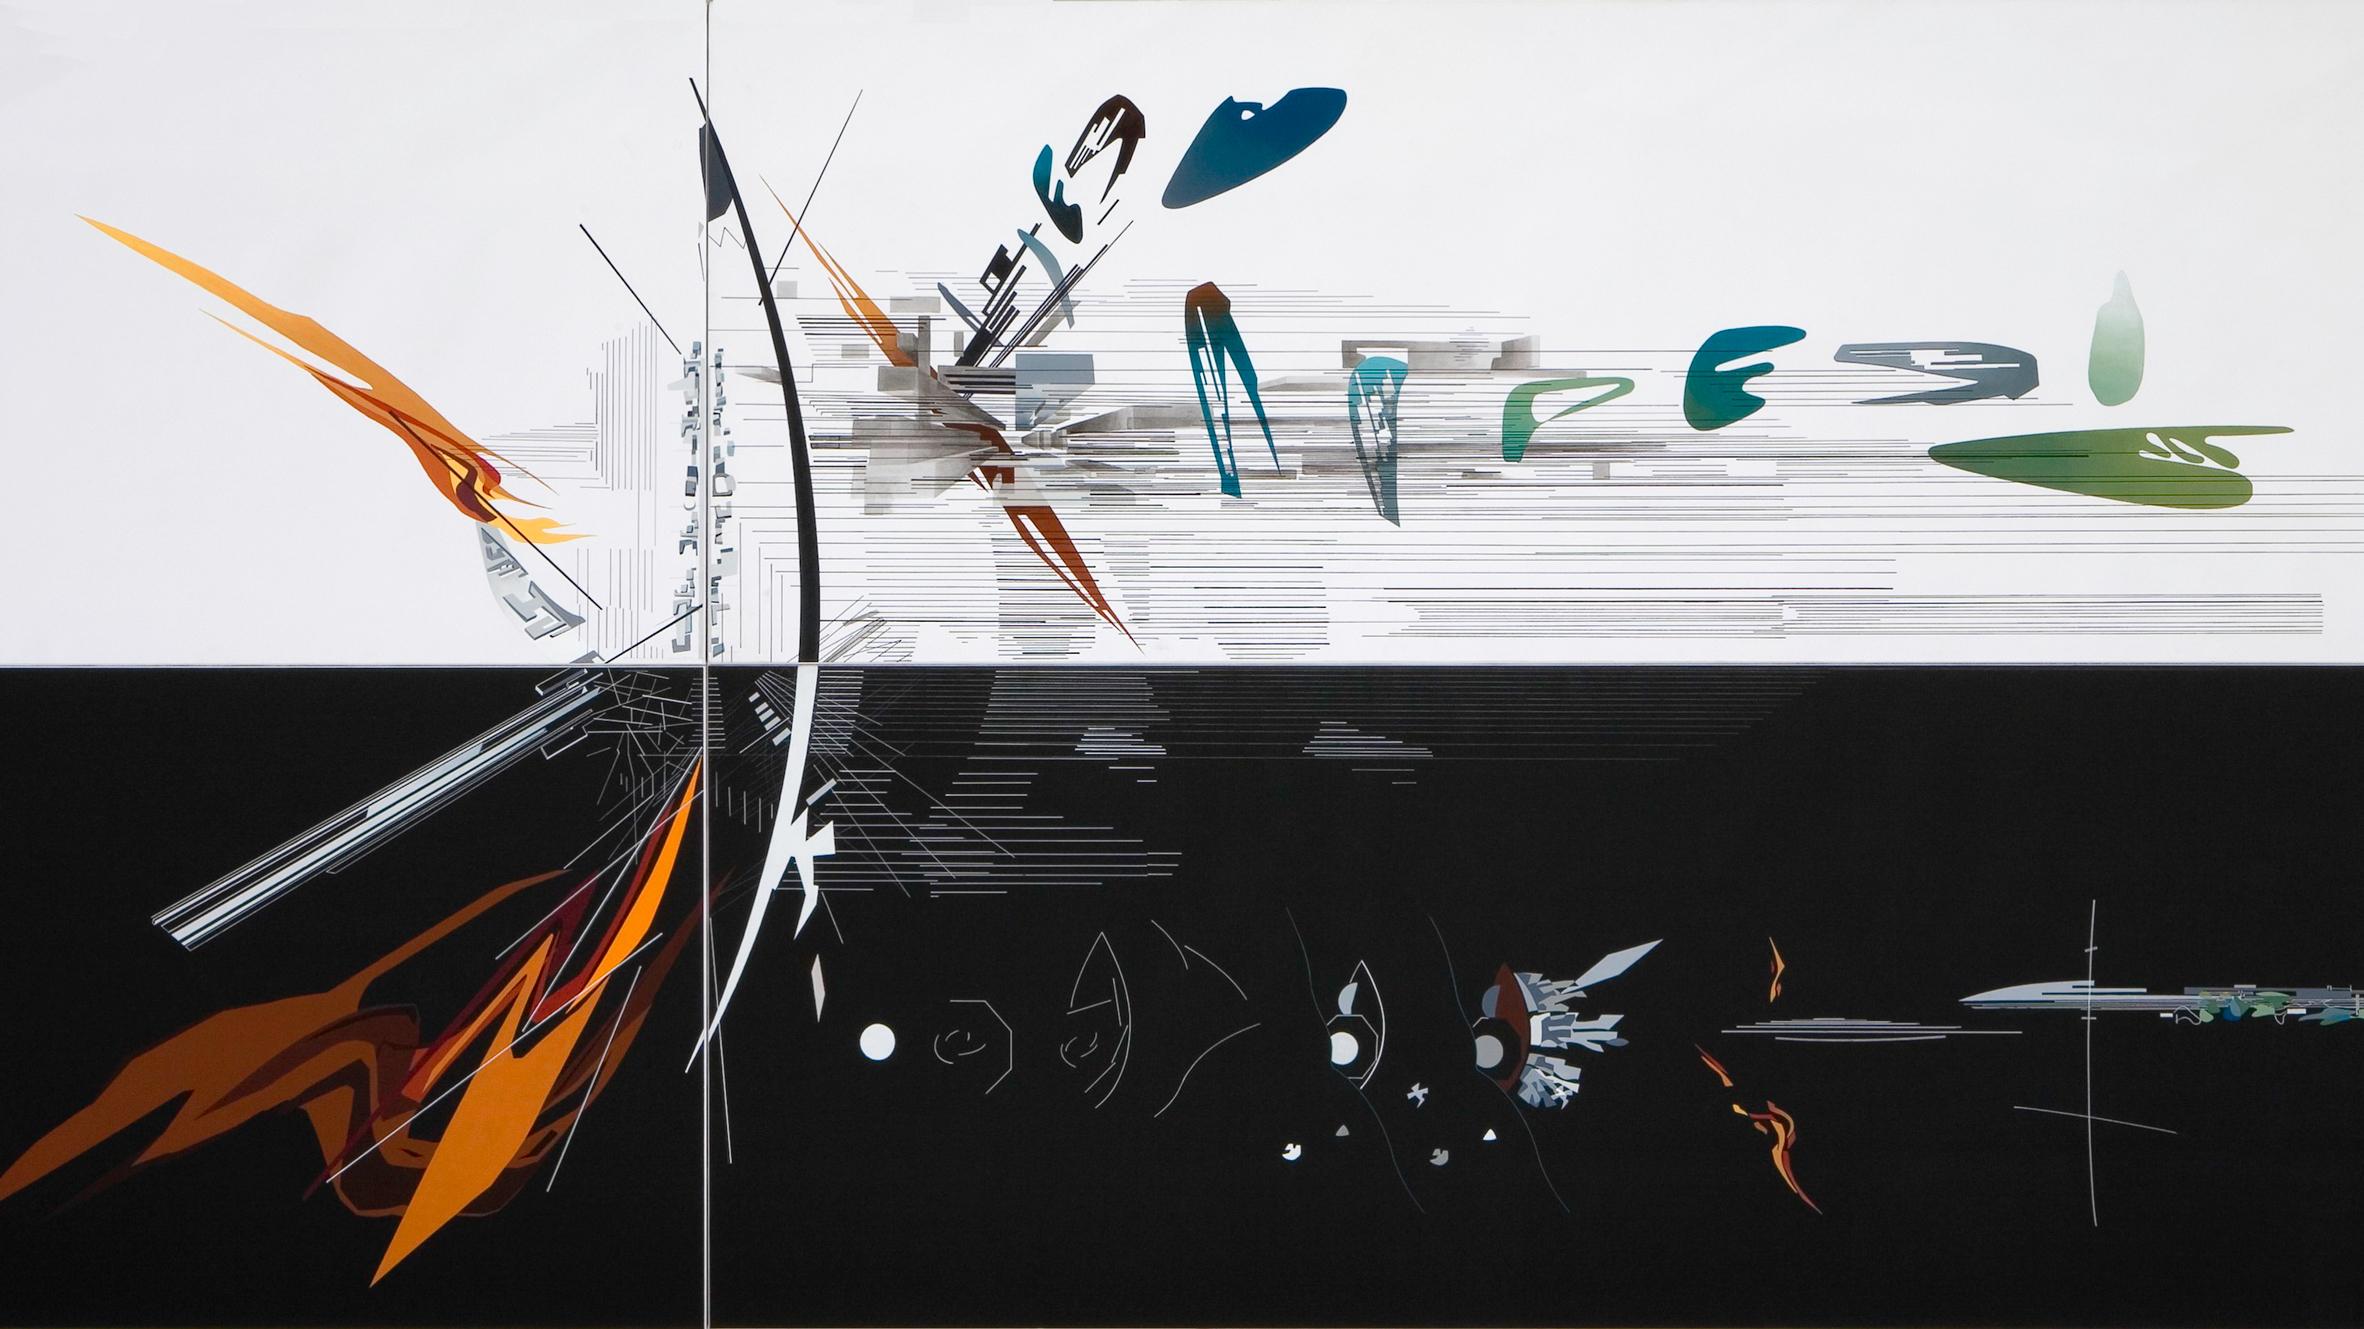 zaha-hadid-exhibition-drawings-serpentine-galleries_dezeen_hero01.jpg